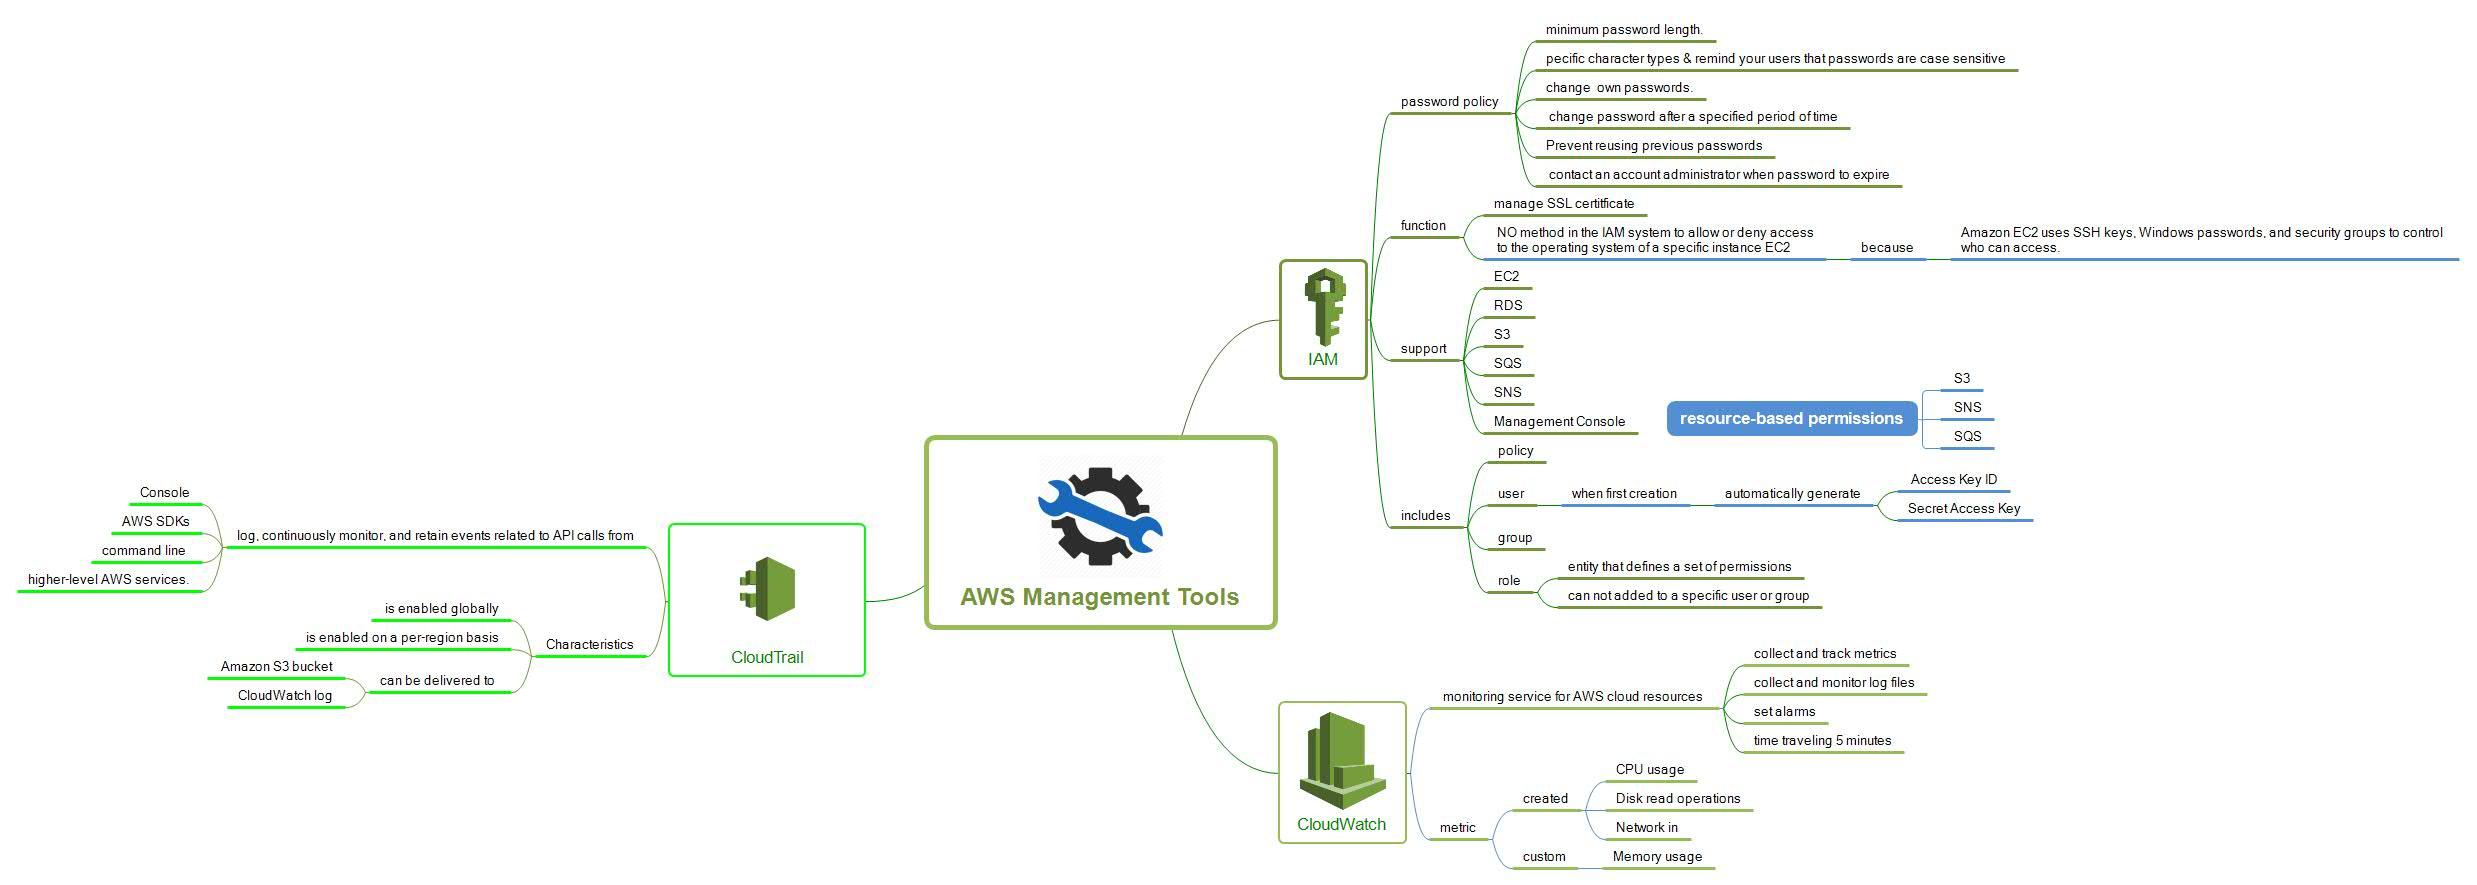 AWSManagementTools AWSManagementTools